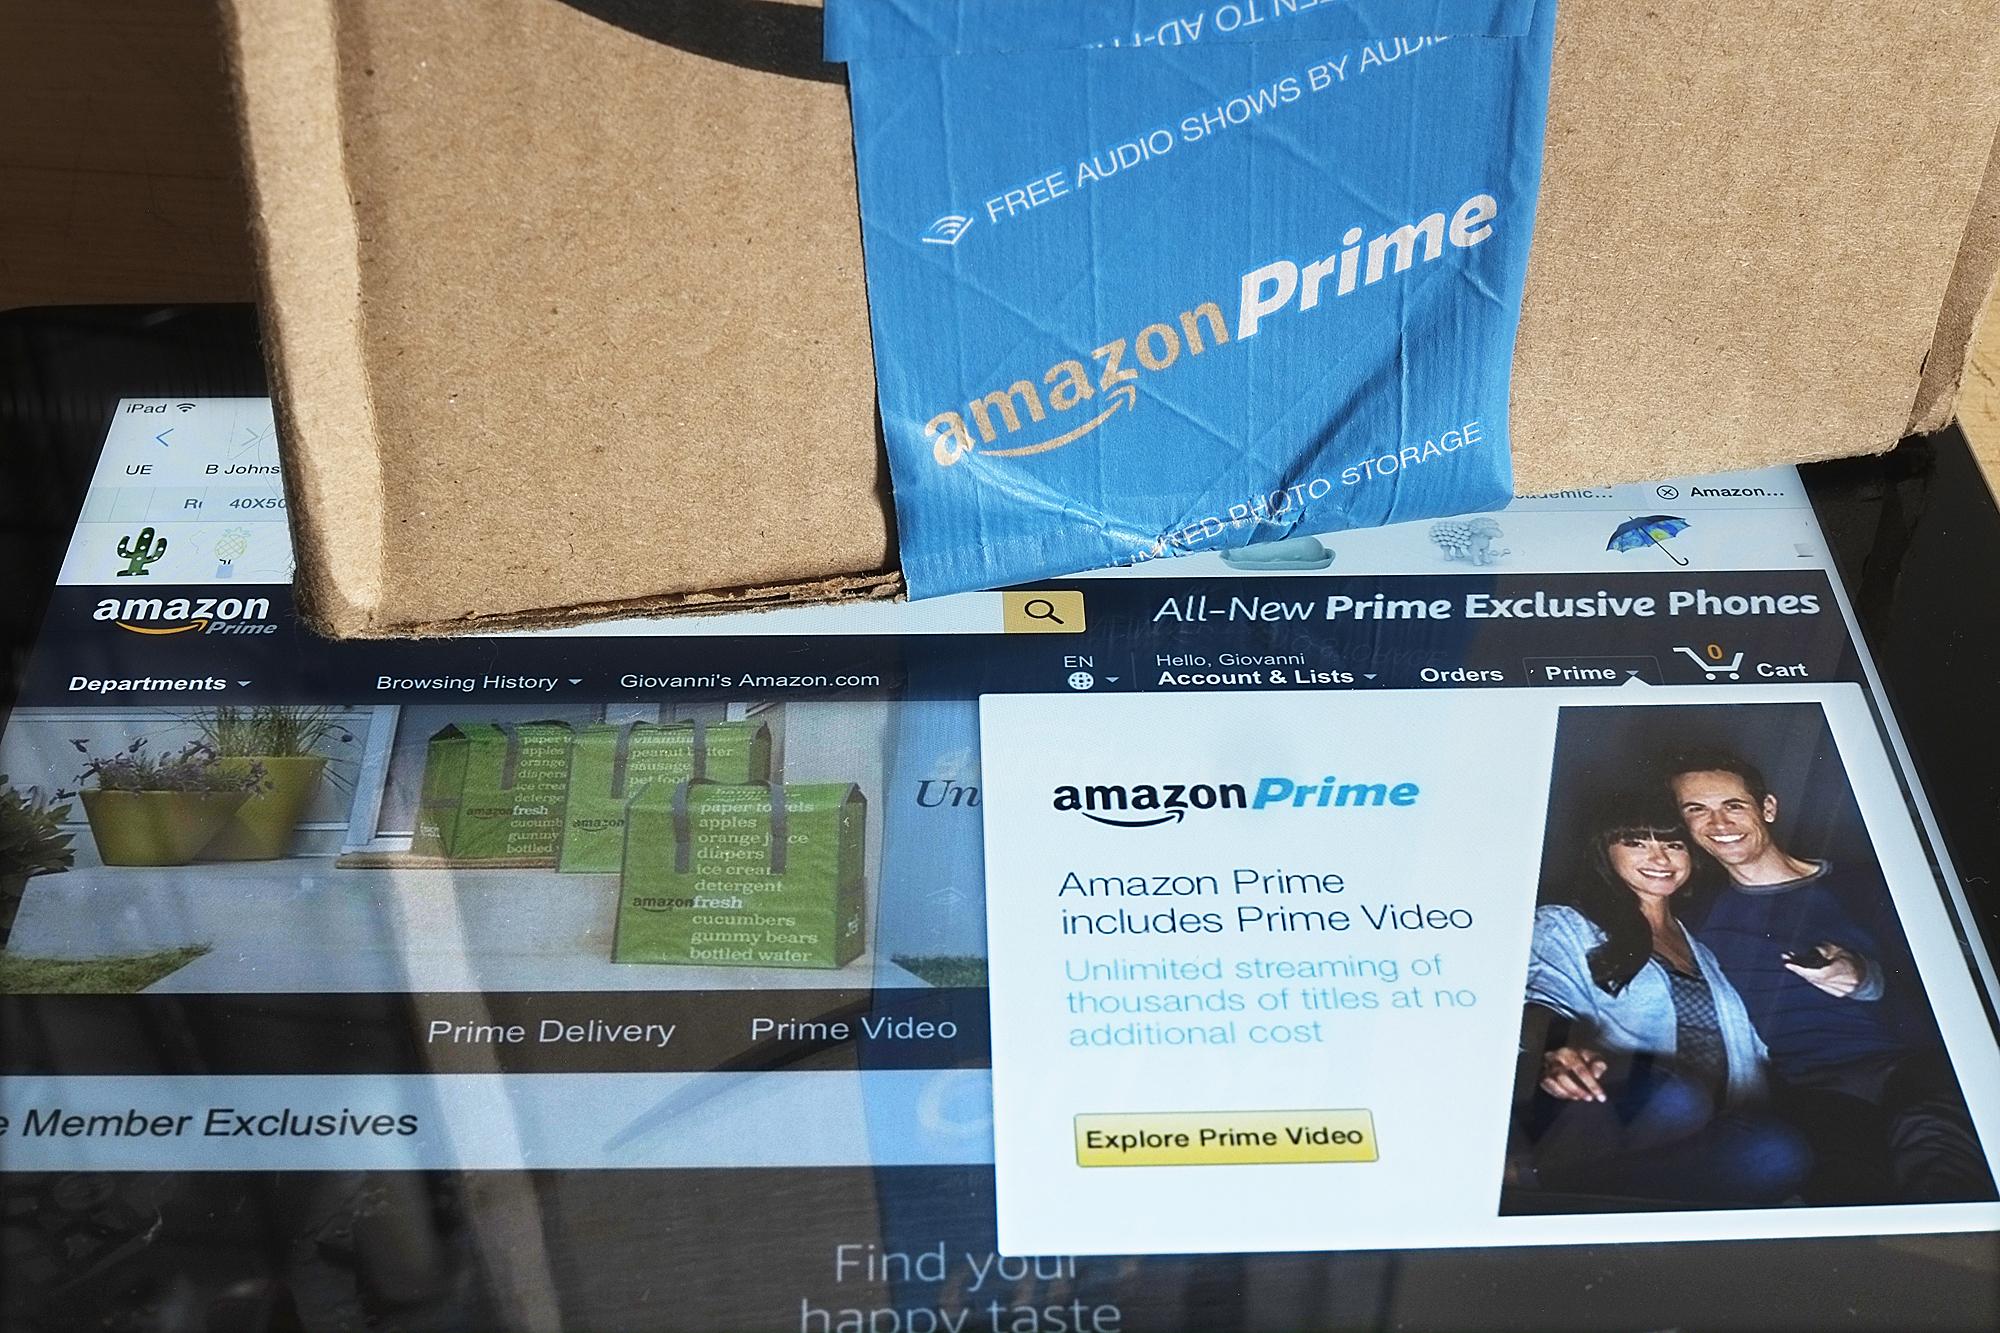 Amazon box and website on iPad